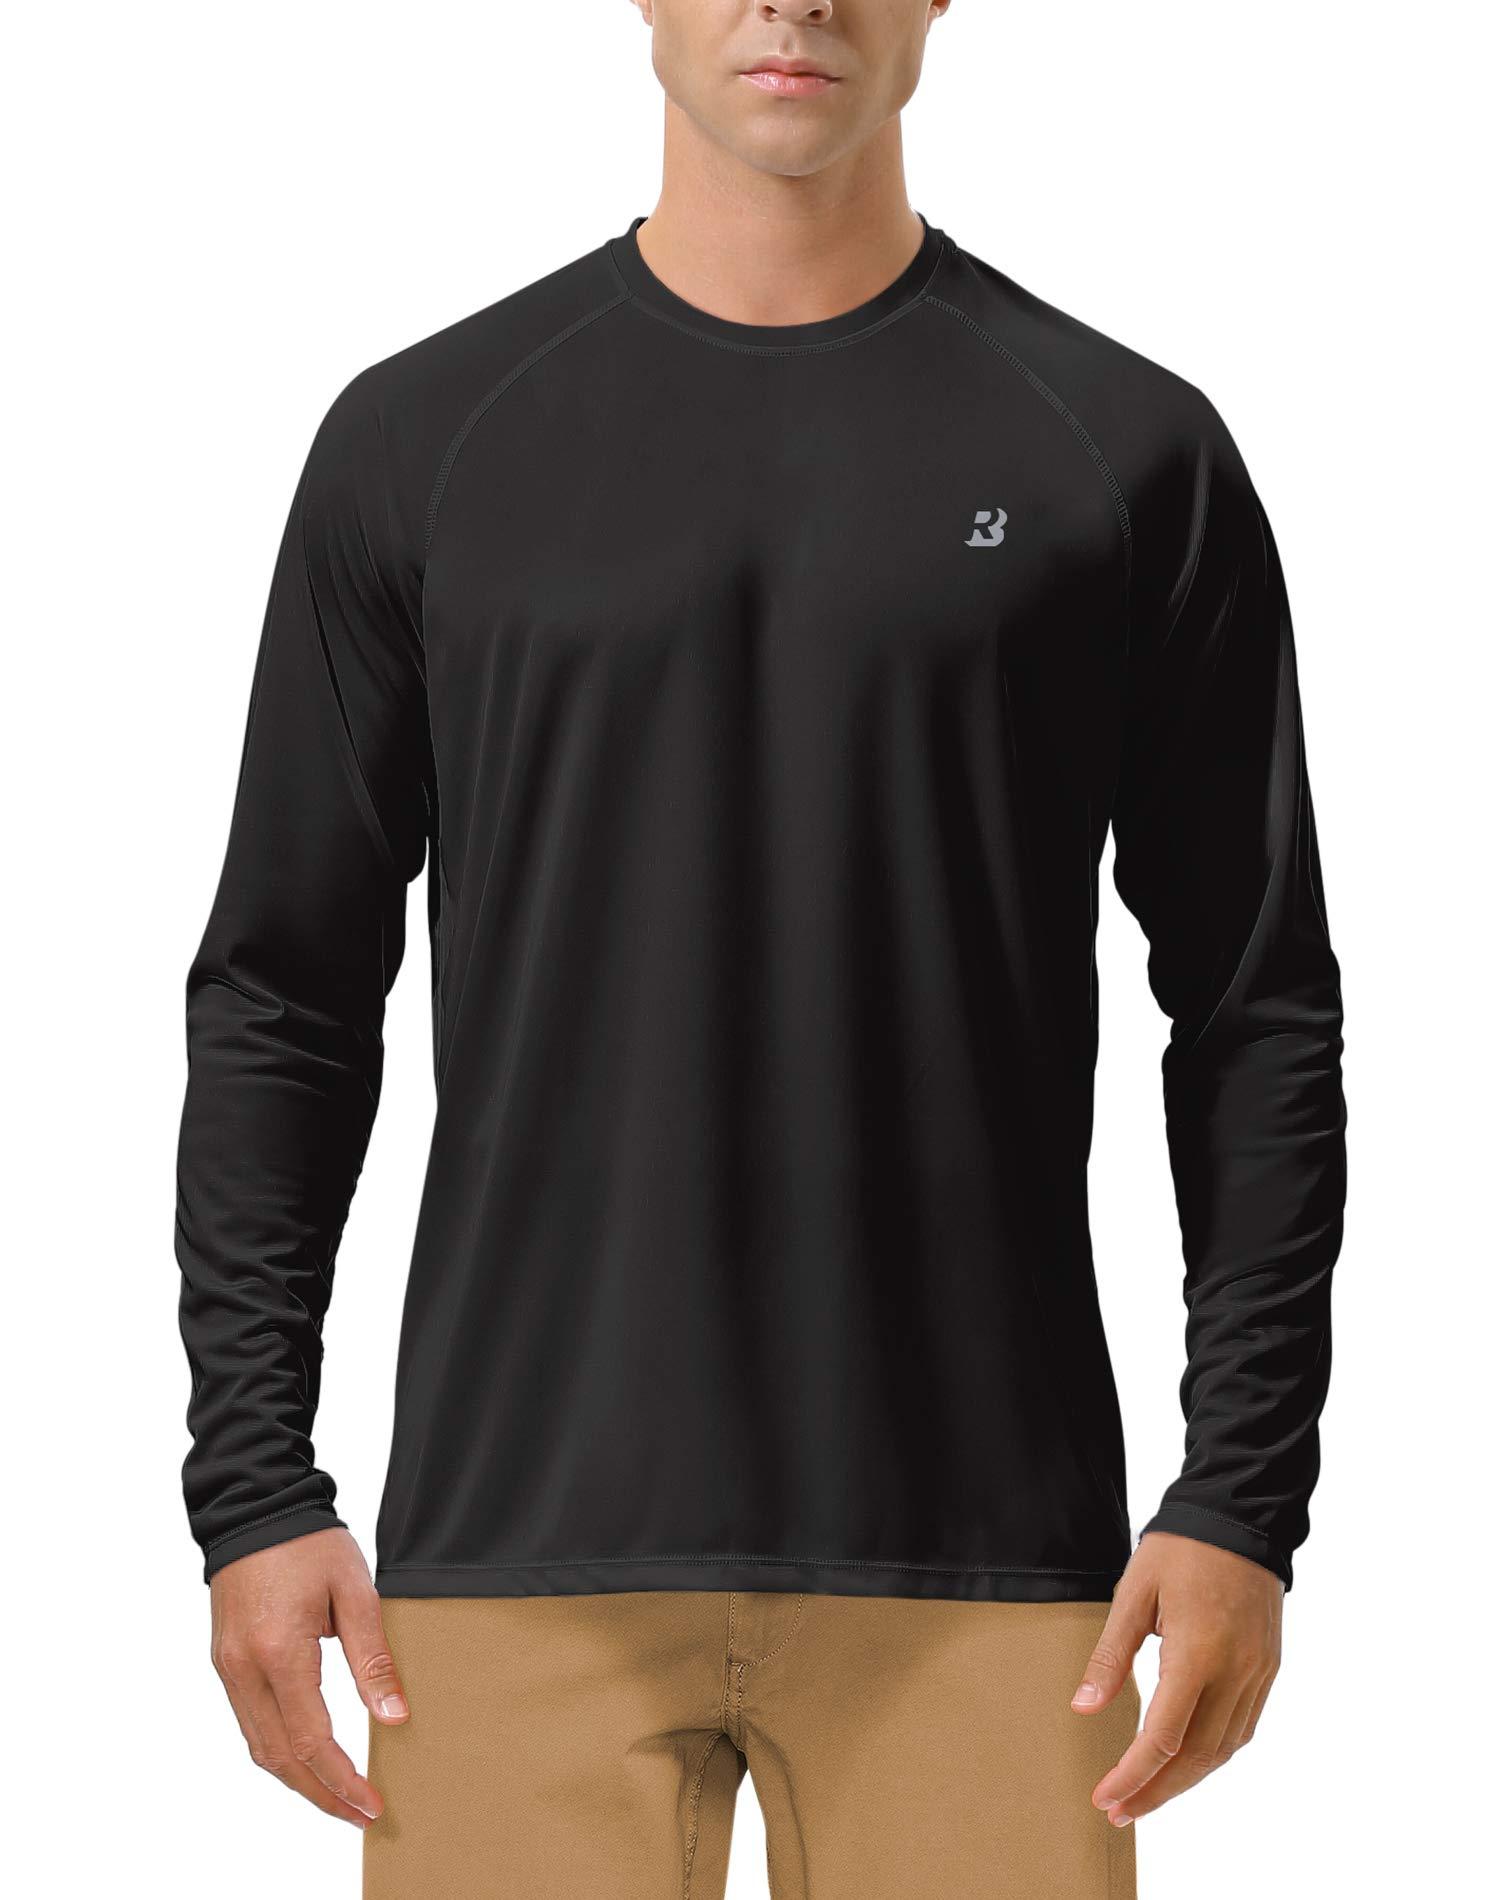 Roadbox Men's Sun Protection UPF 50+ UV Outdoor Long Sleeve Dri-fit T-Shirt Rashguard for Running, Fishing, Hiking(Small, Black) by Roadbox